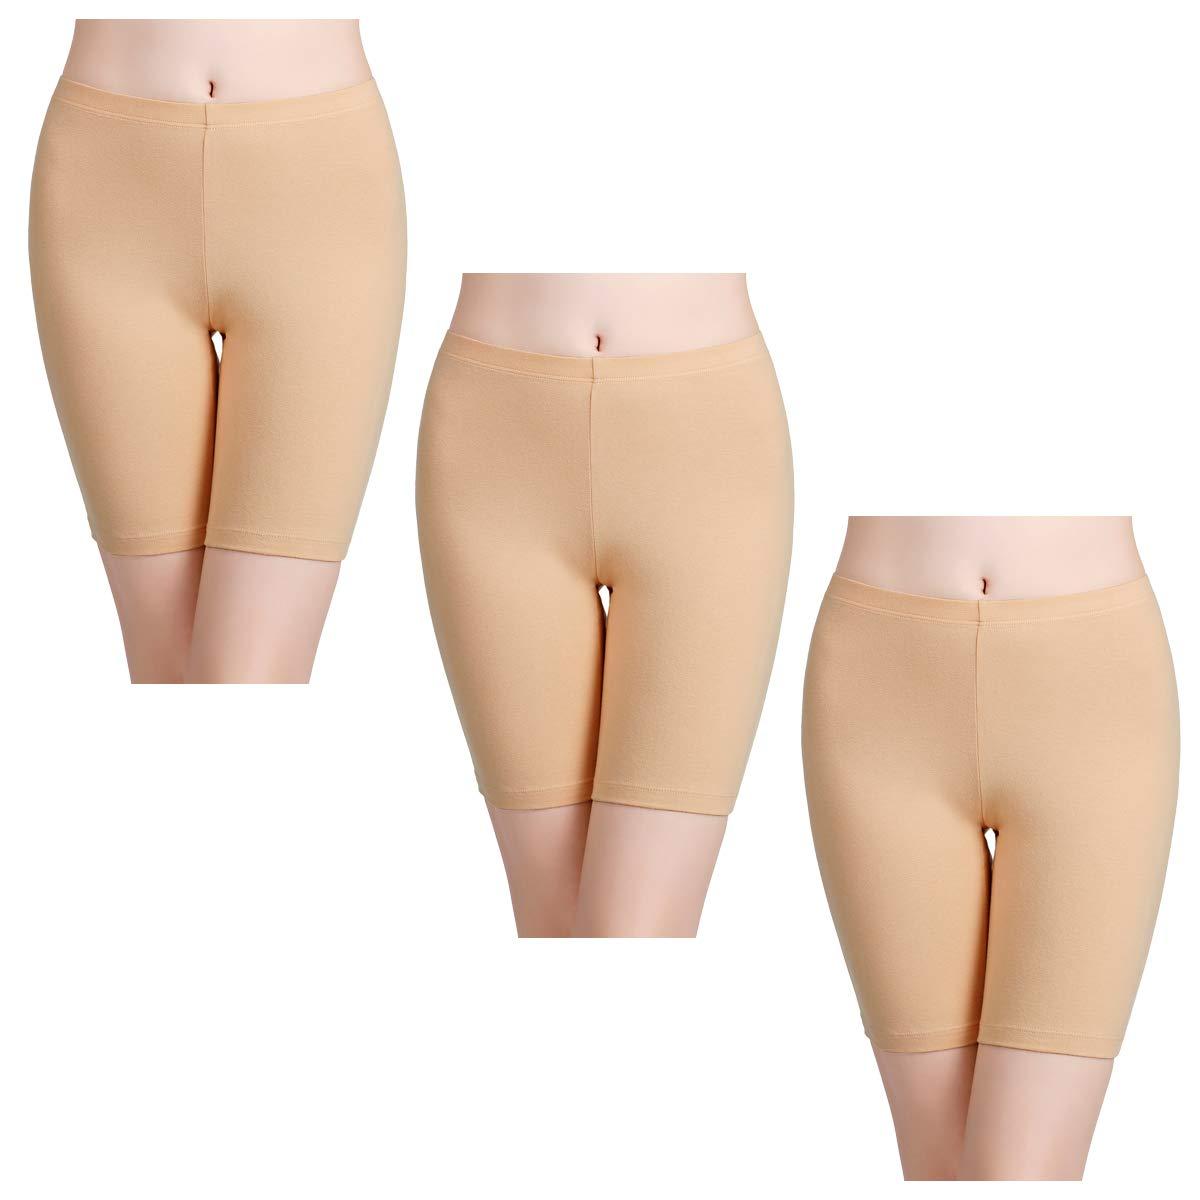 5df44522ca9 wirarpa Women's Anti Chafing Cotton Shorts Long Leg Knickers Ladies Soft  Boxer Shorts Underwear 3 Pack: Amazon.co.uk: Clothing